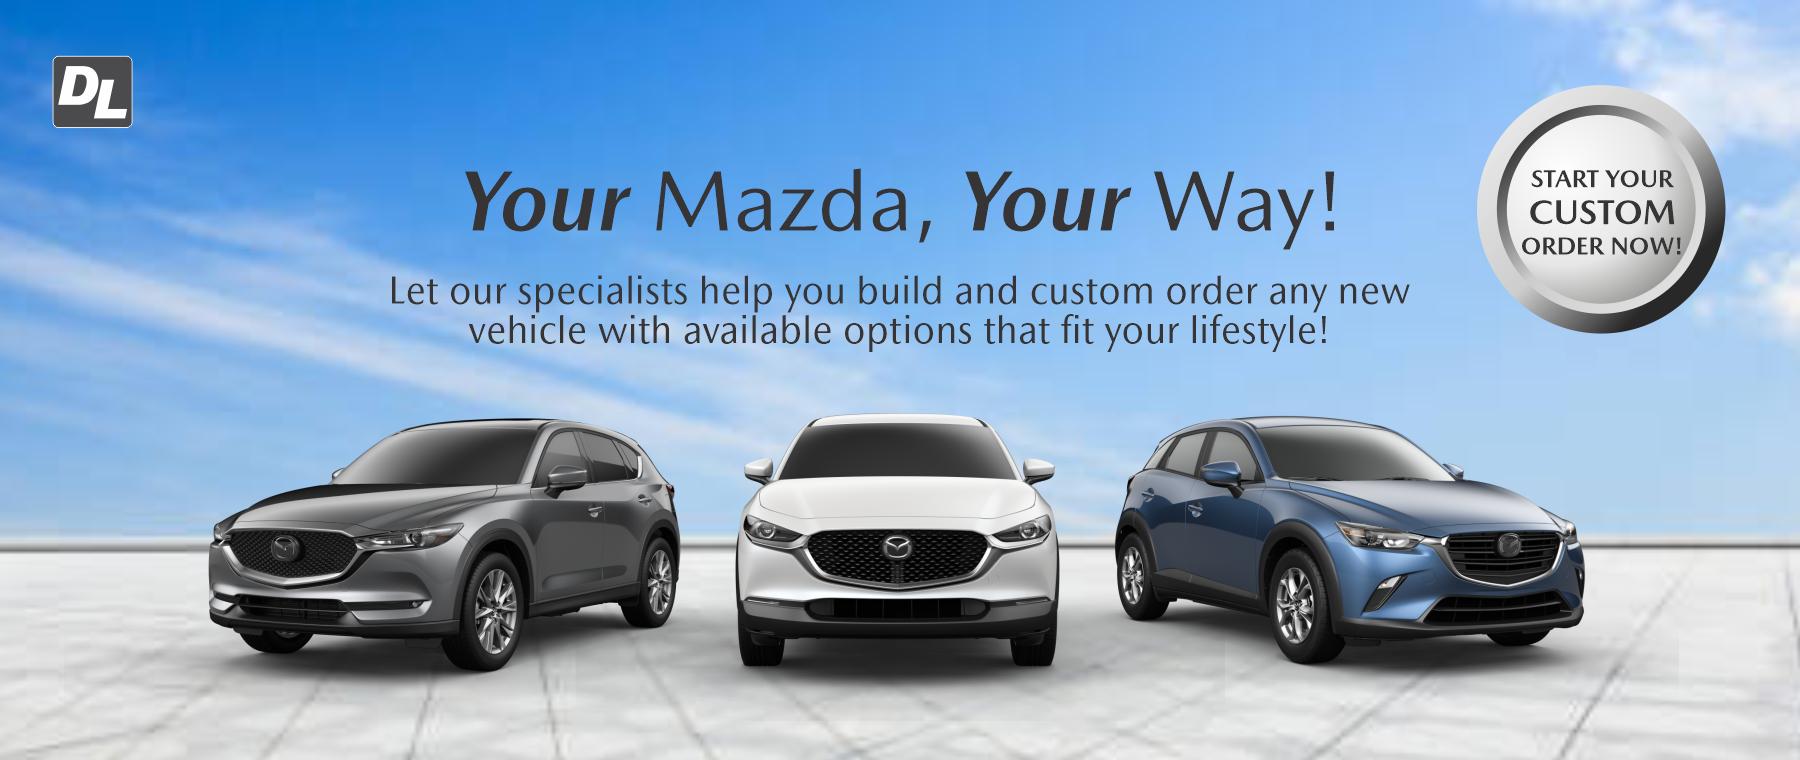 banner-customorder-Mazda2